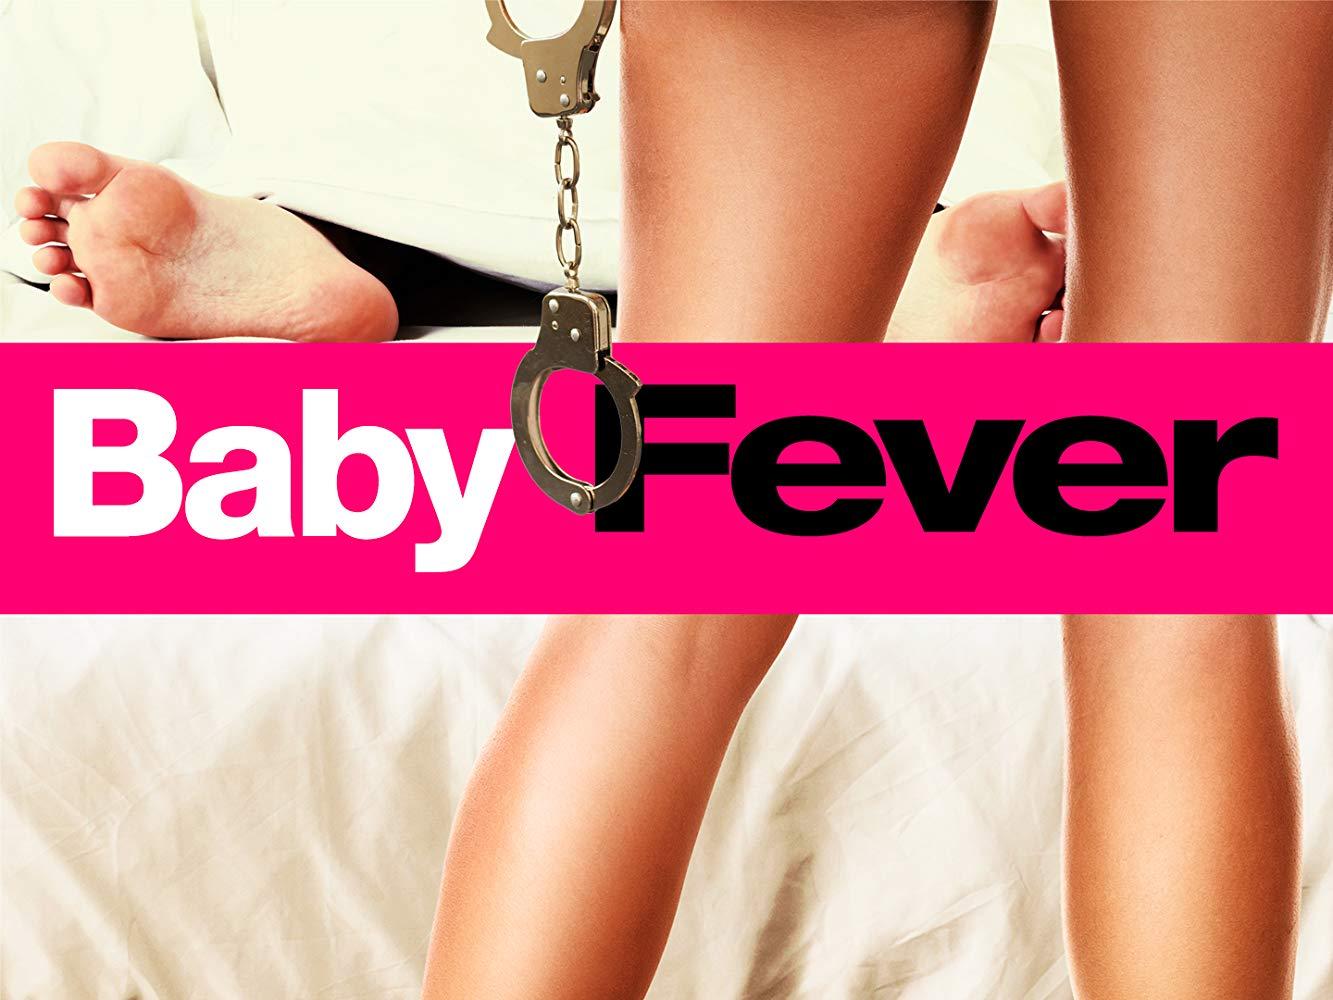 Baby Fever 2017 WEB x264-ASSOCiATE